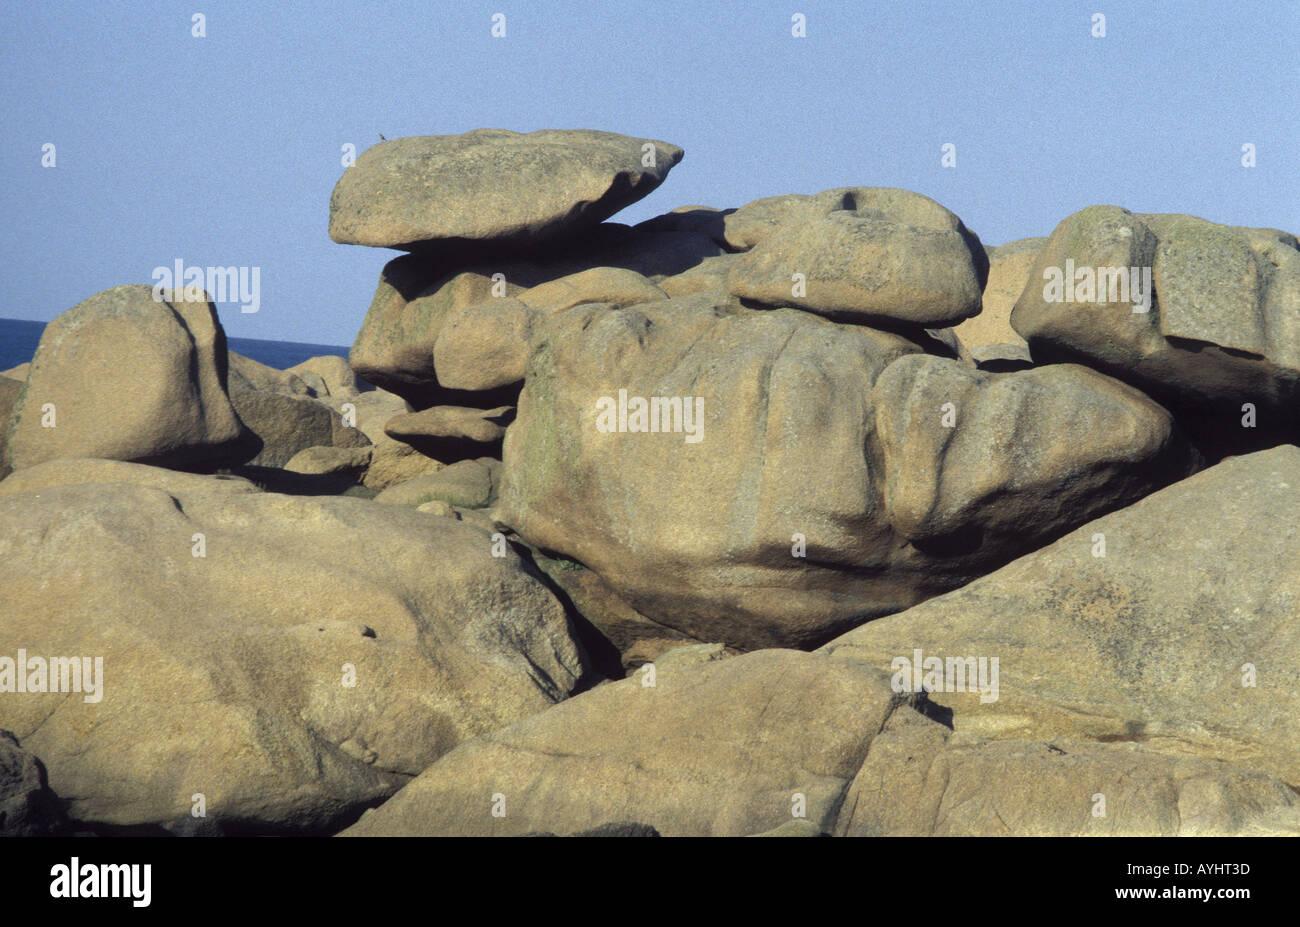 Steinformation bei Ploumanac Bretagne Frankreich - Stock Image